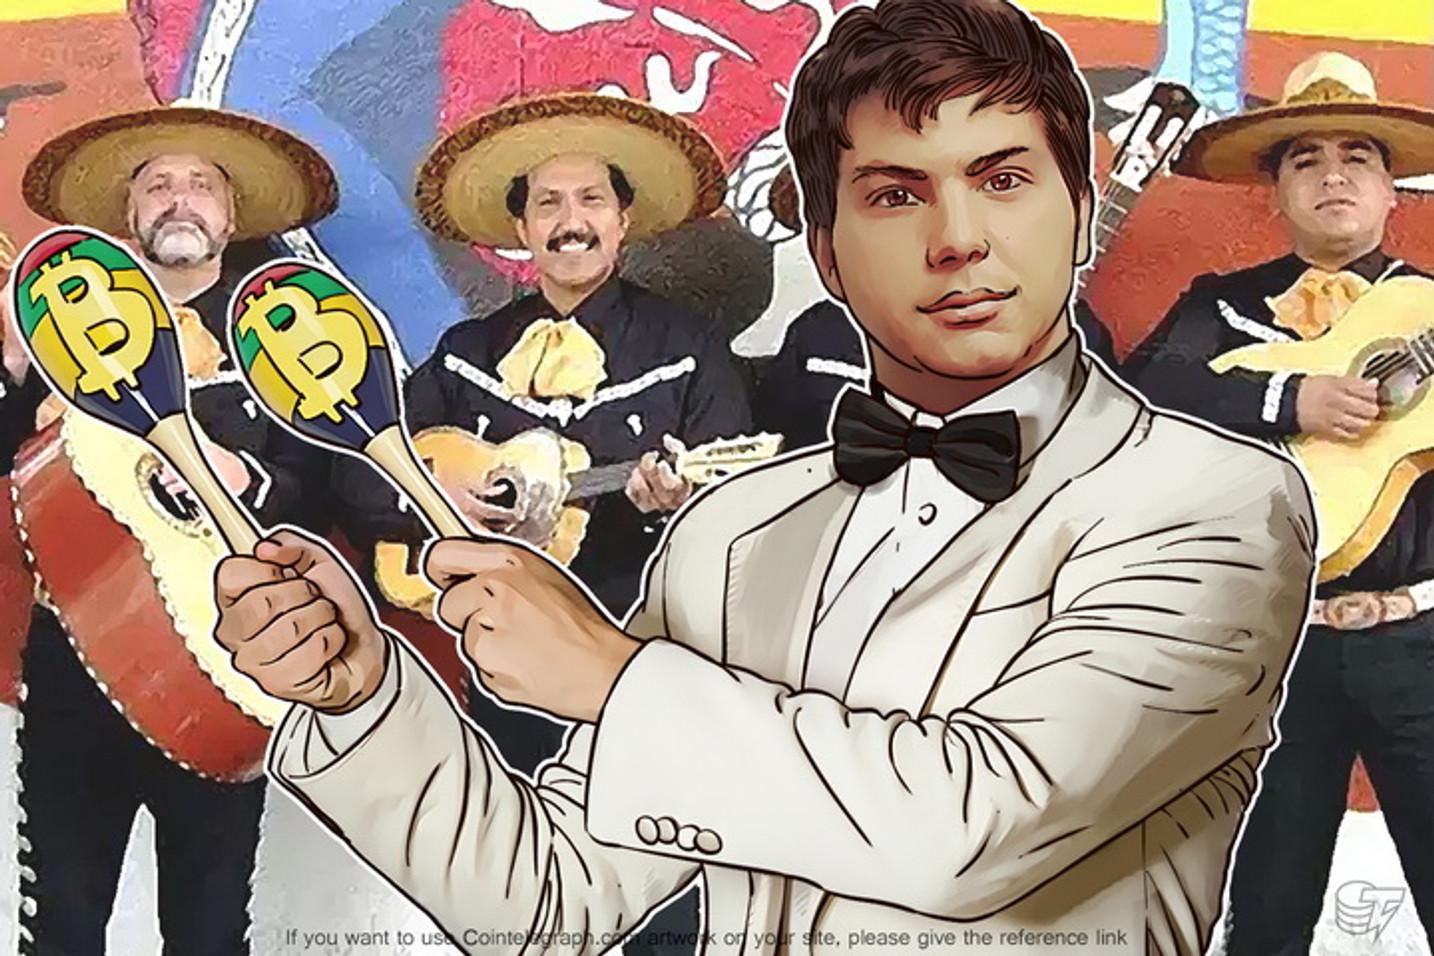 enBitcoins Remittances Expands to Mexico